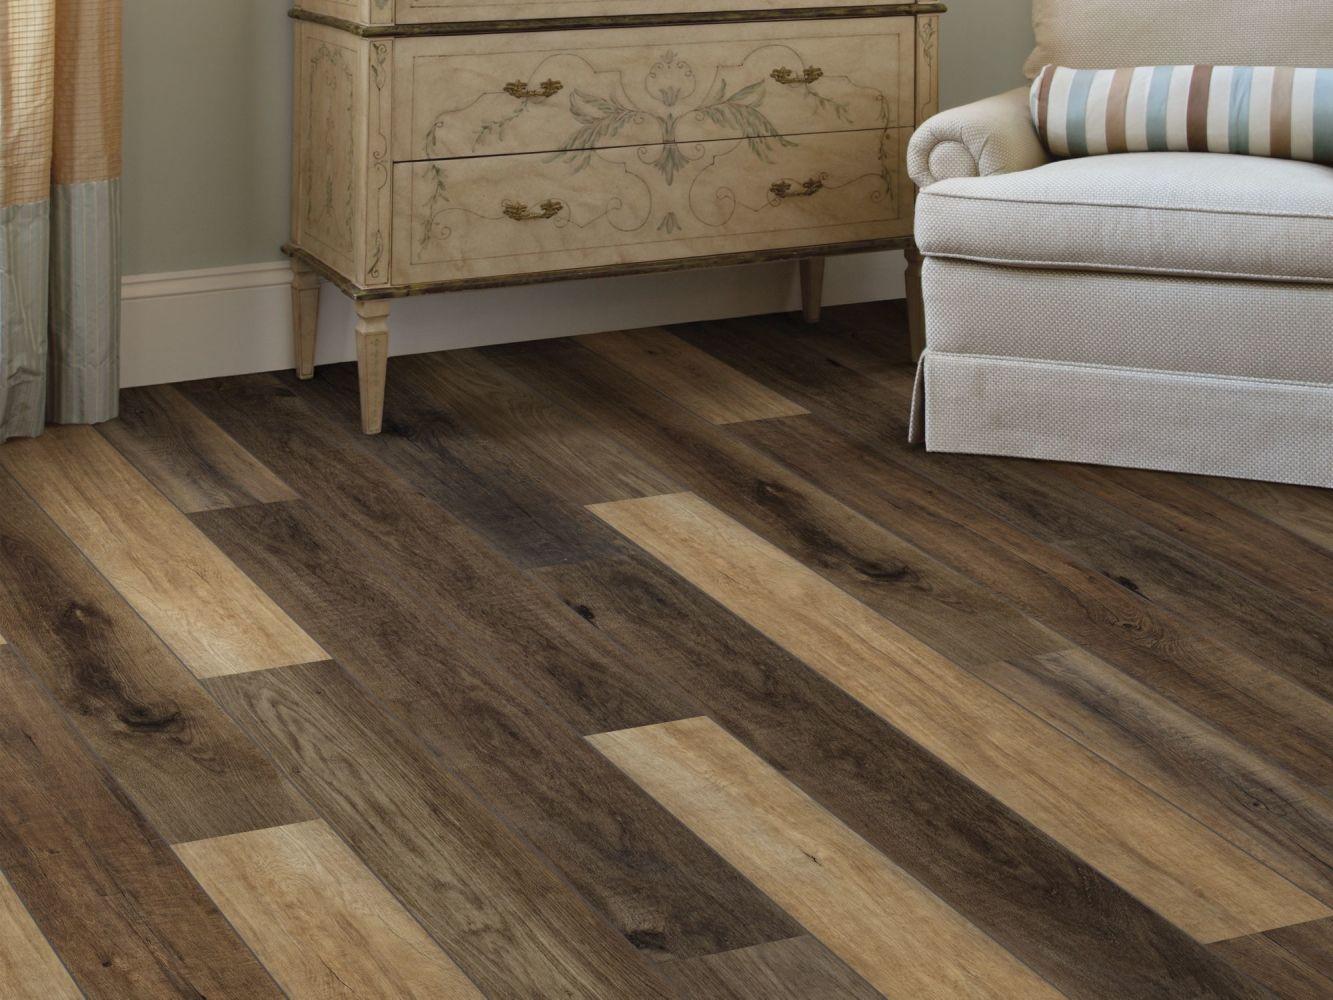 Shaw Floors Resilient Property Solutions Stature Plus Classic Oak 07035_VE371